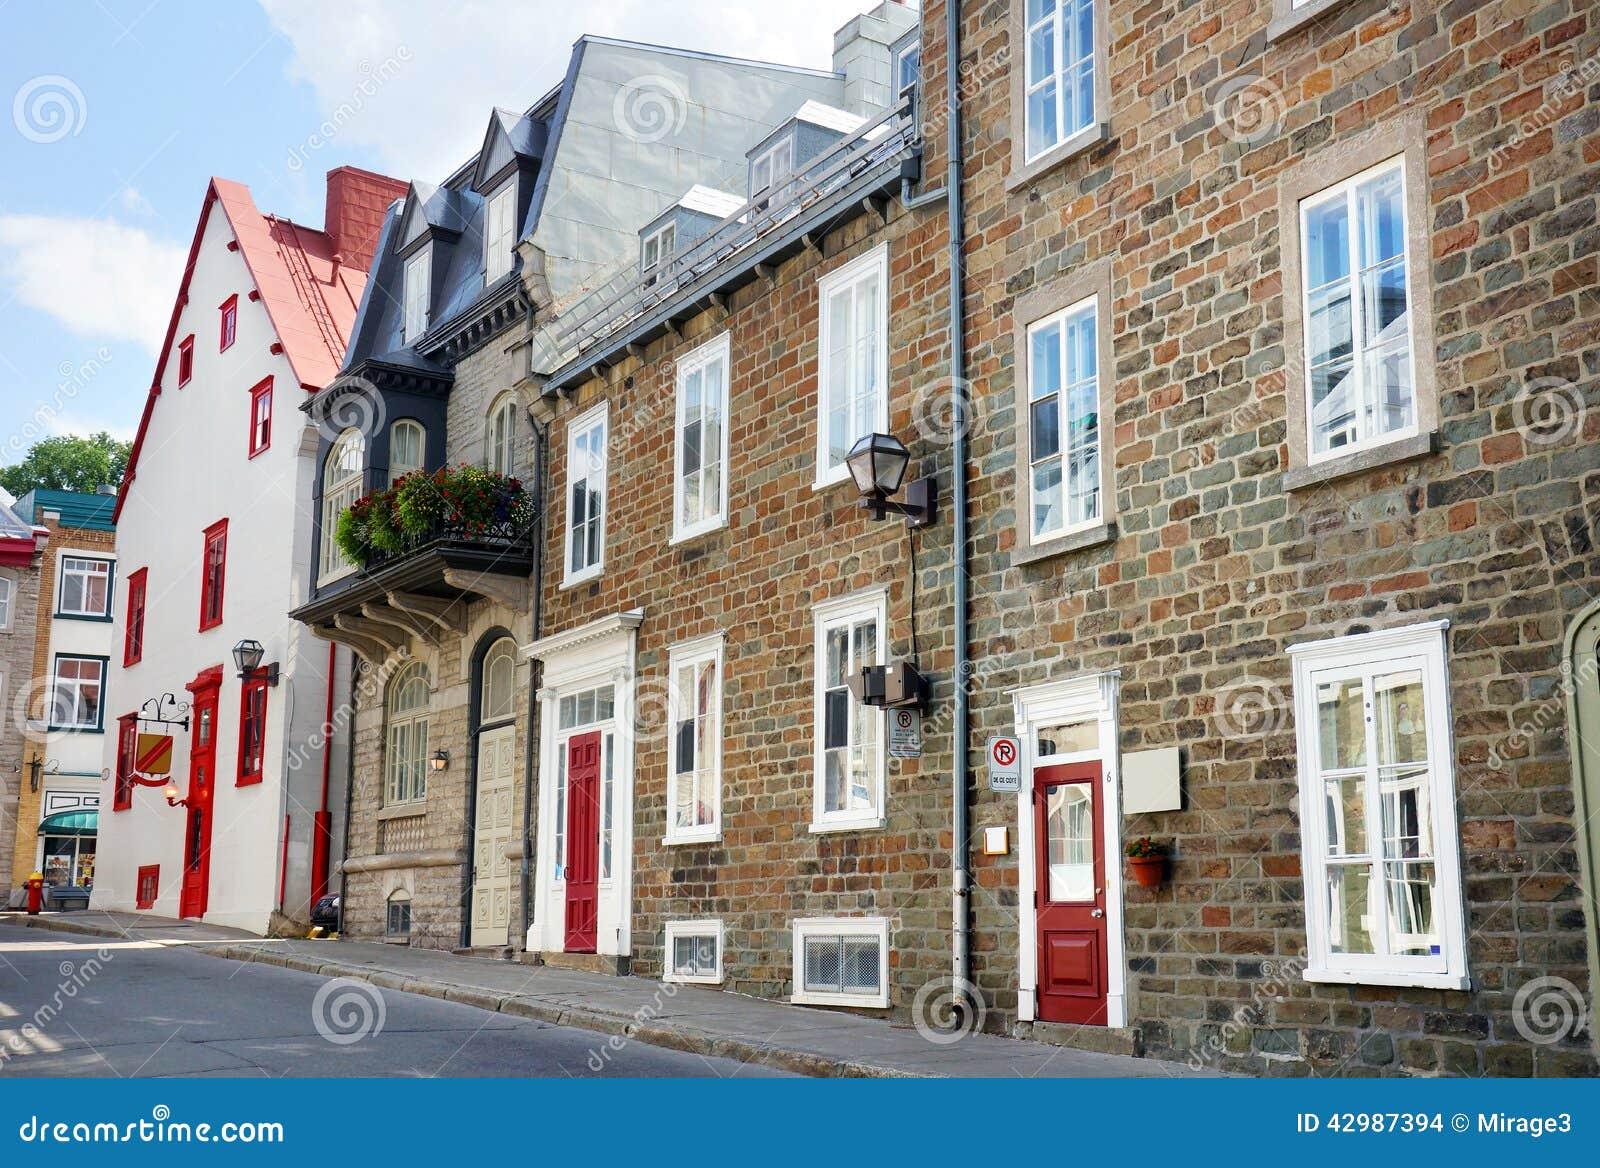 Row Of Old Brick Houses Stock Photo Image 42987394